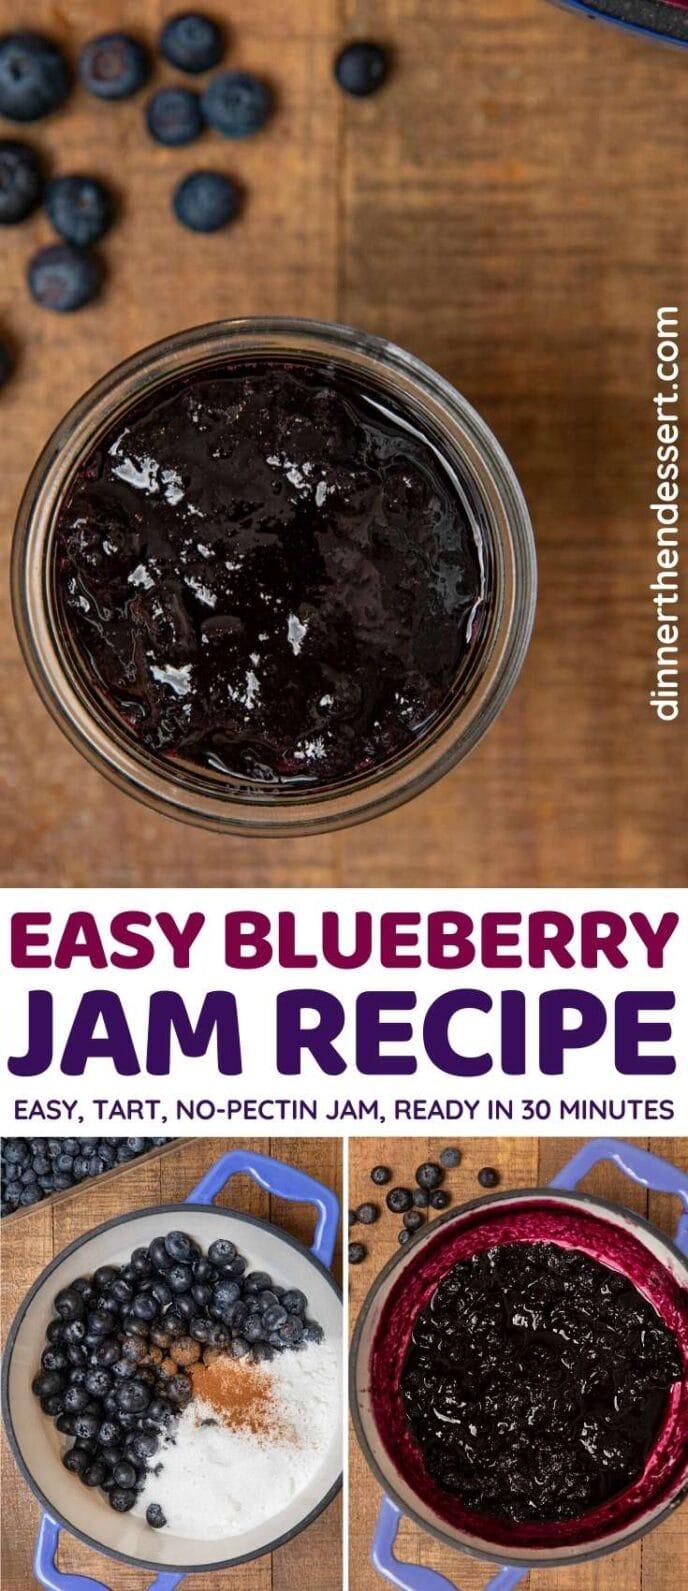 Blueberry Jam collage